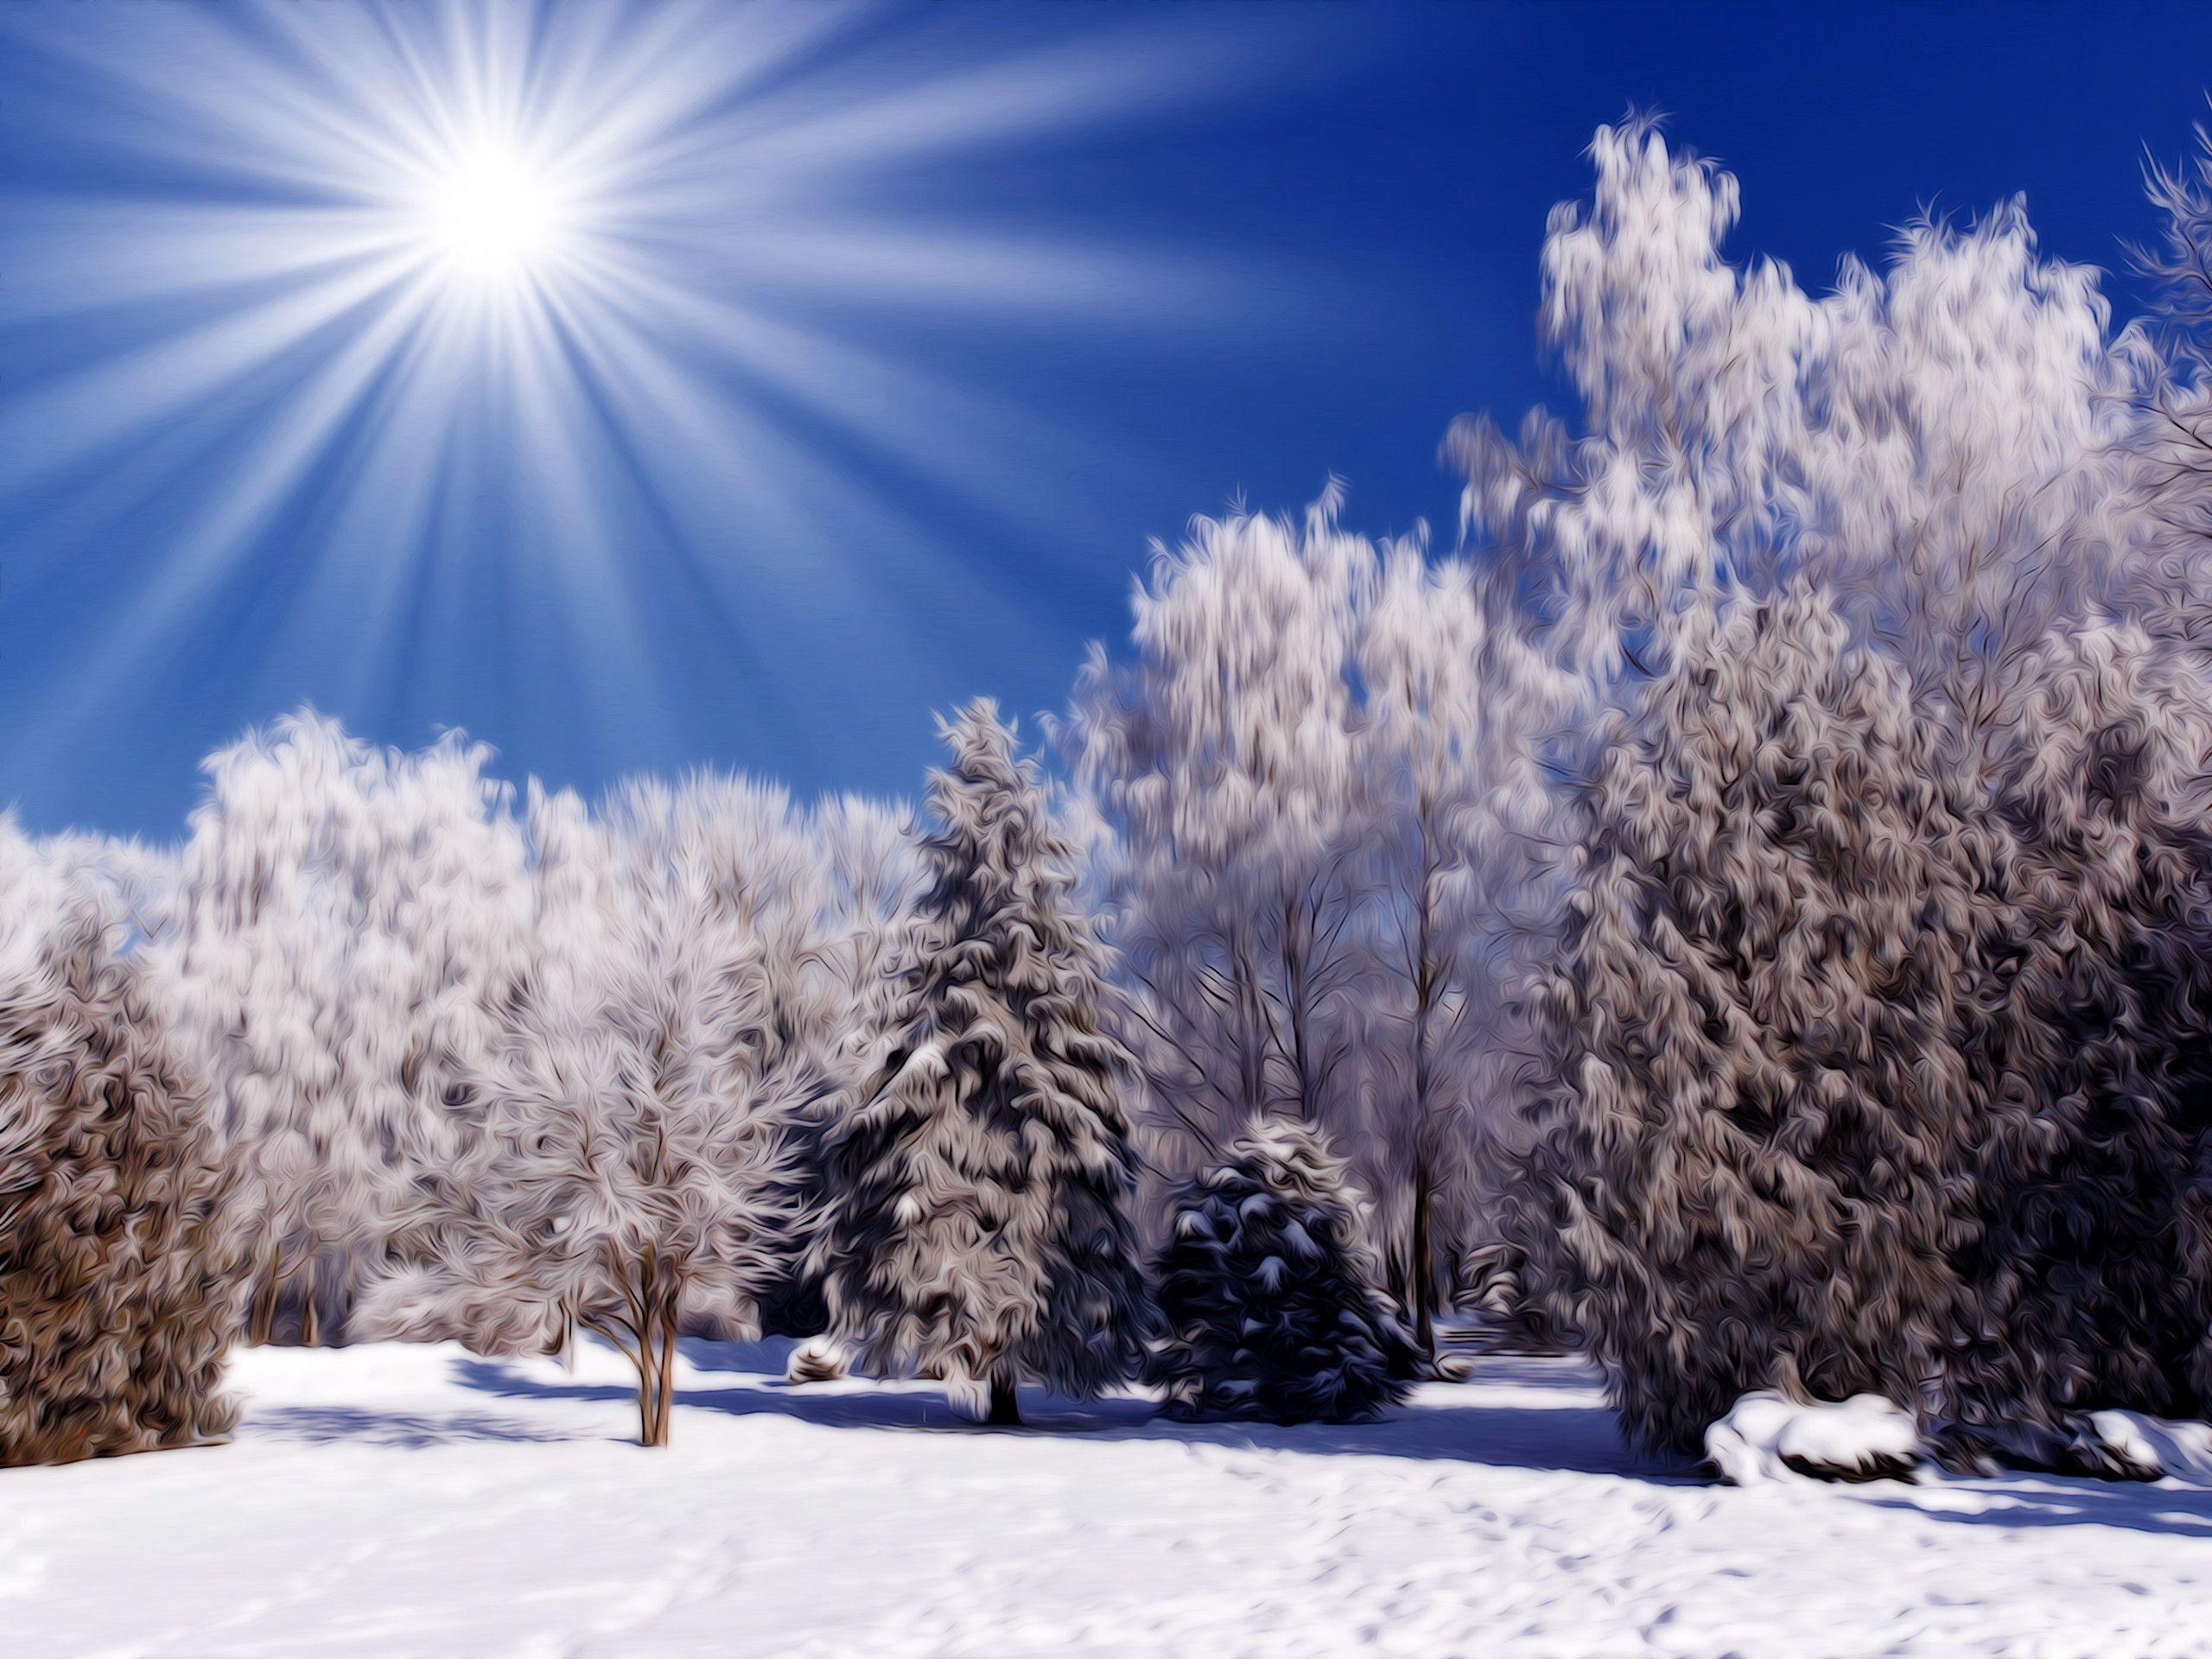 Winter Snow Scenes Wallpaper Free